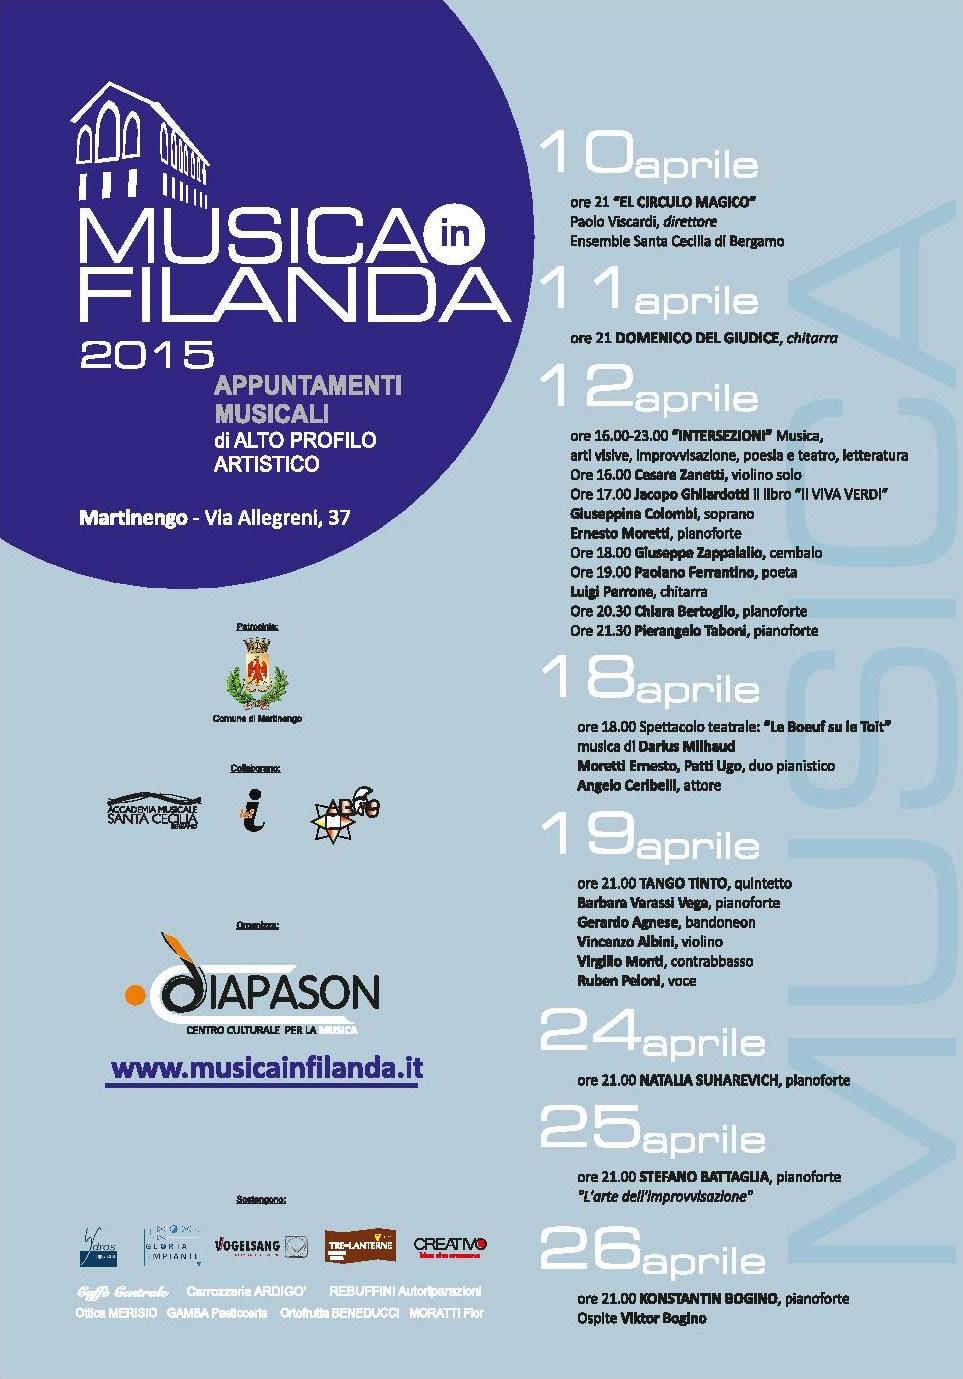 Musica in Filanda